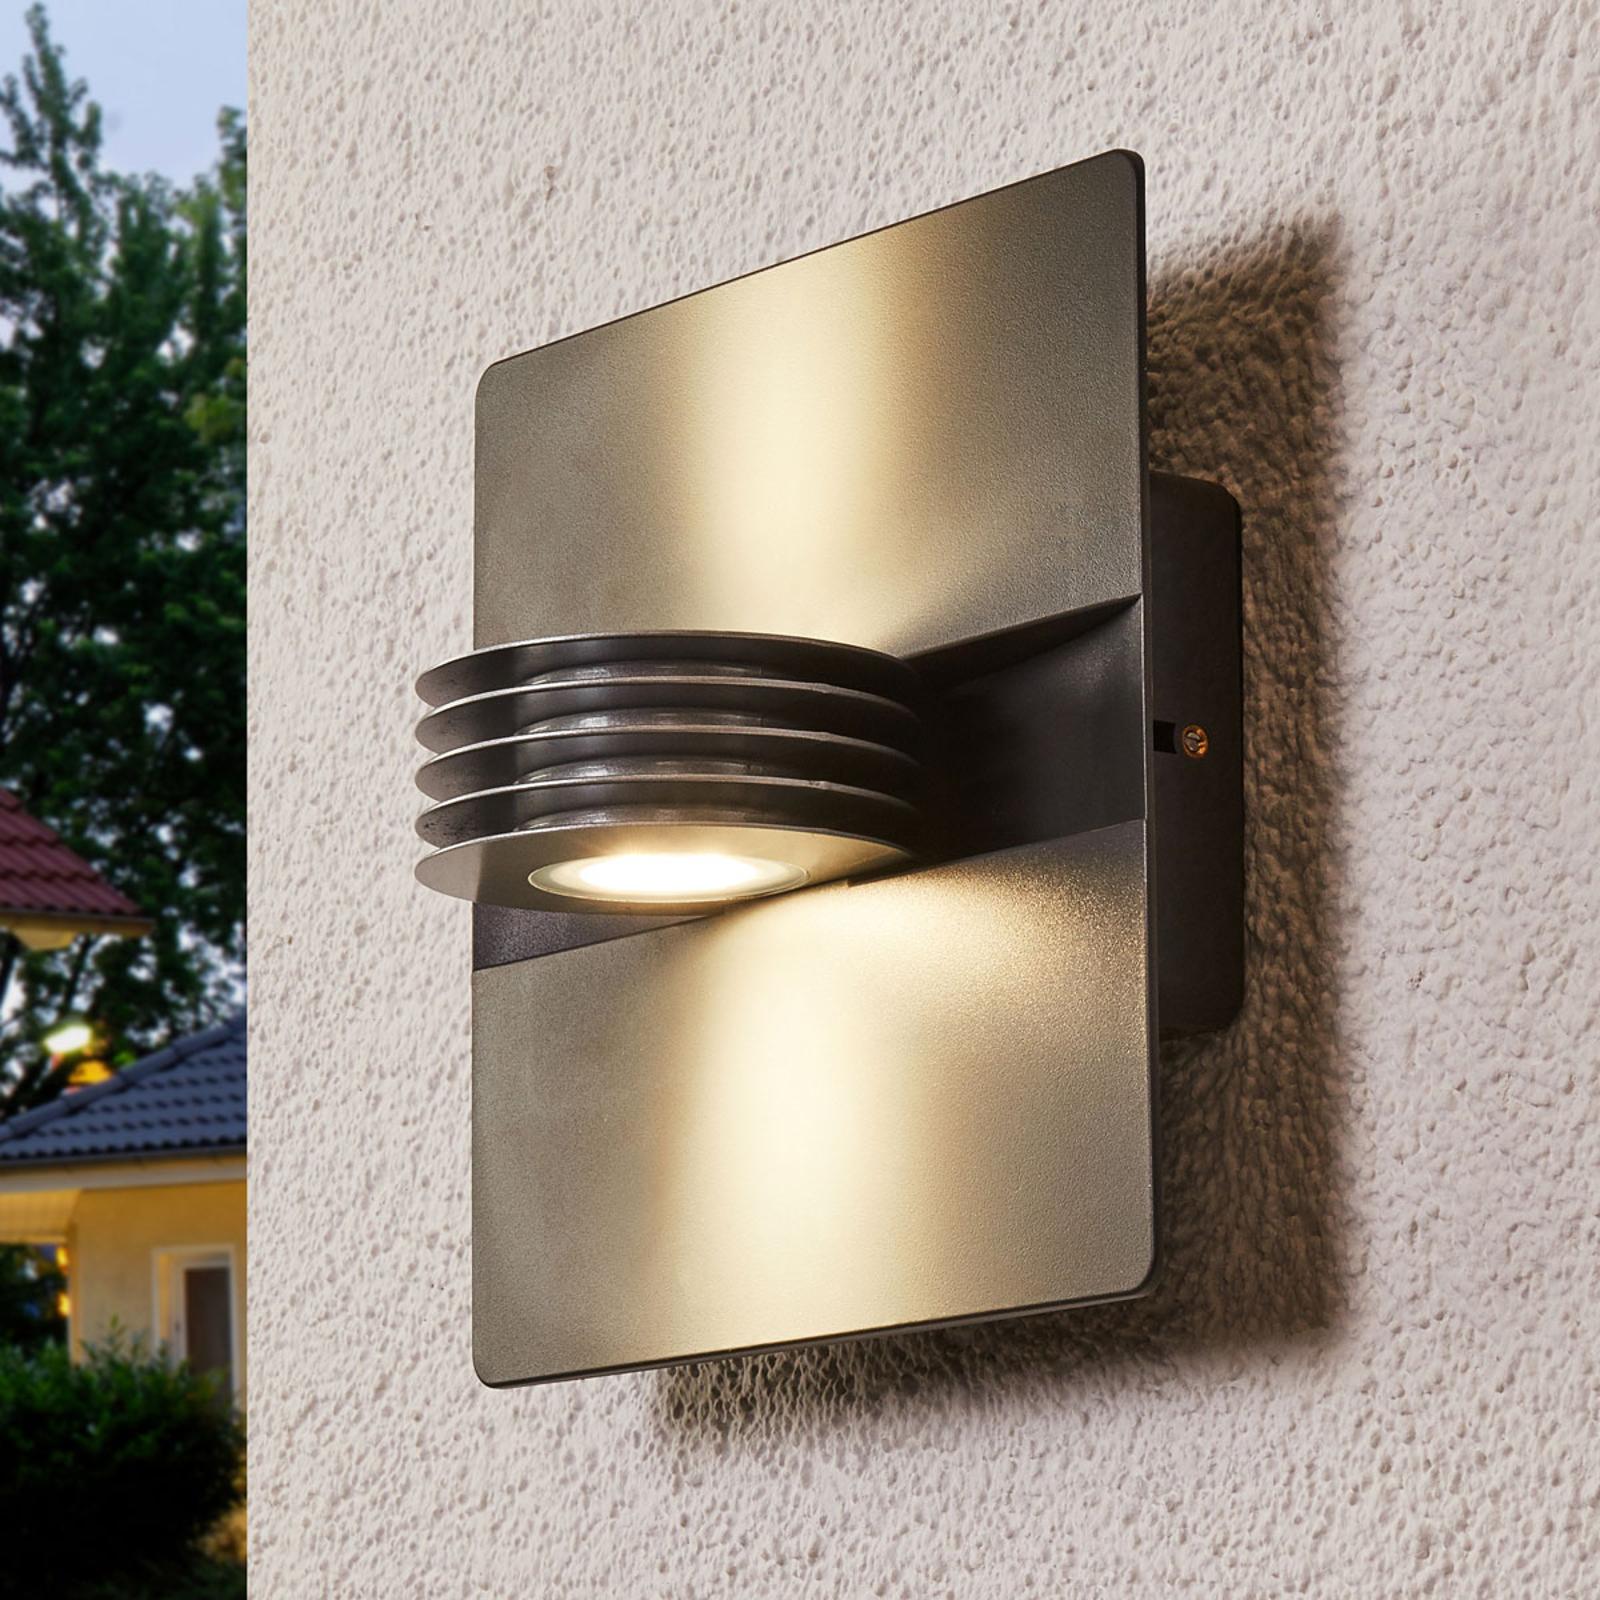 Aplique LED de exterior Split en color antracita